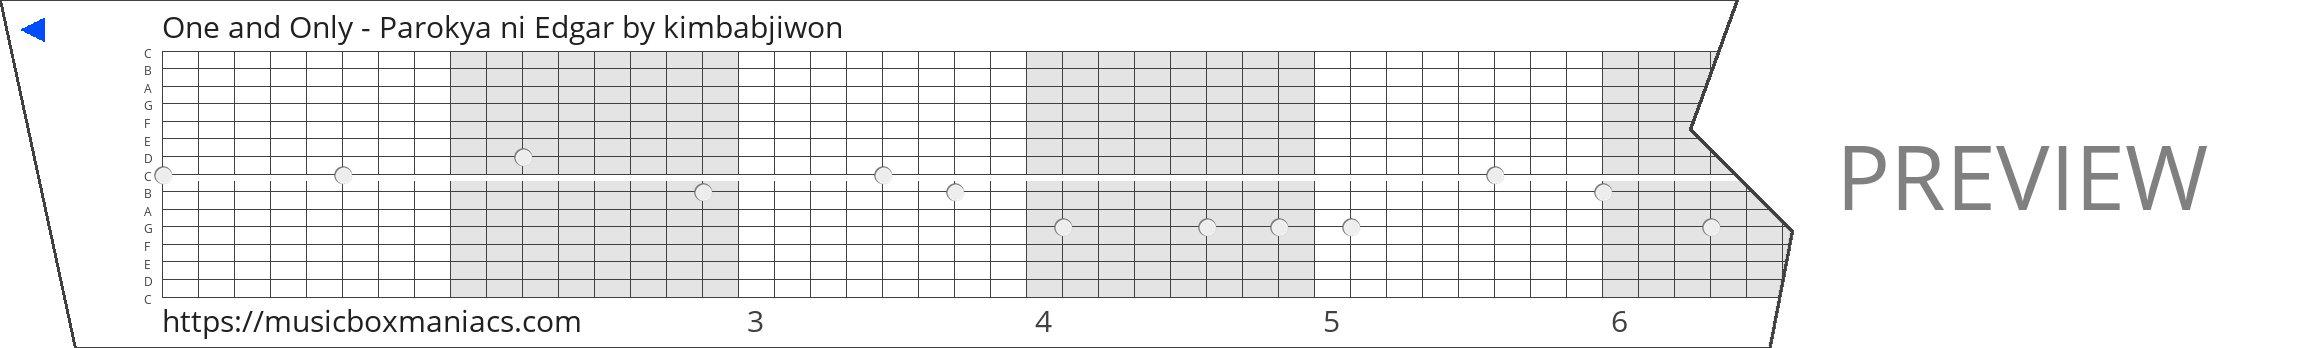 One and Only - Parokya ni Edgar 15 note music box paper strip